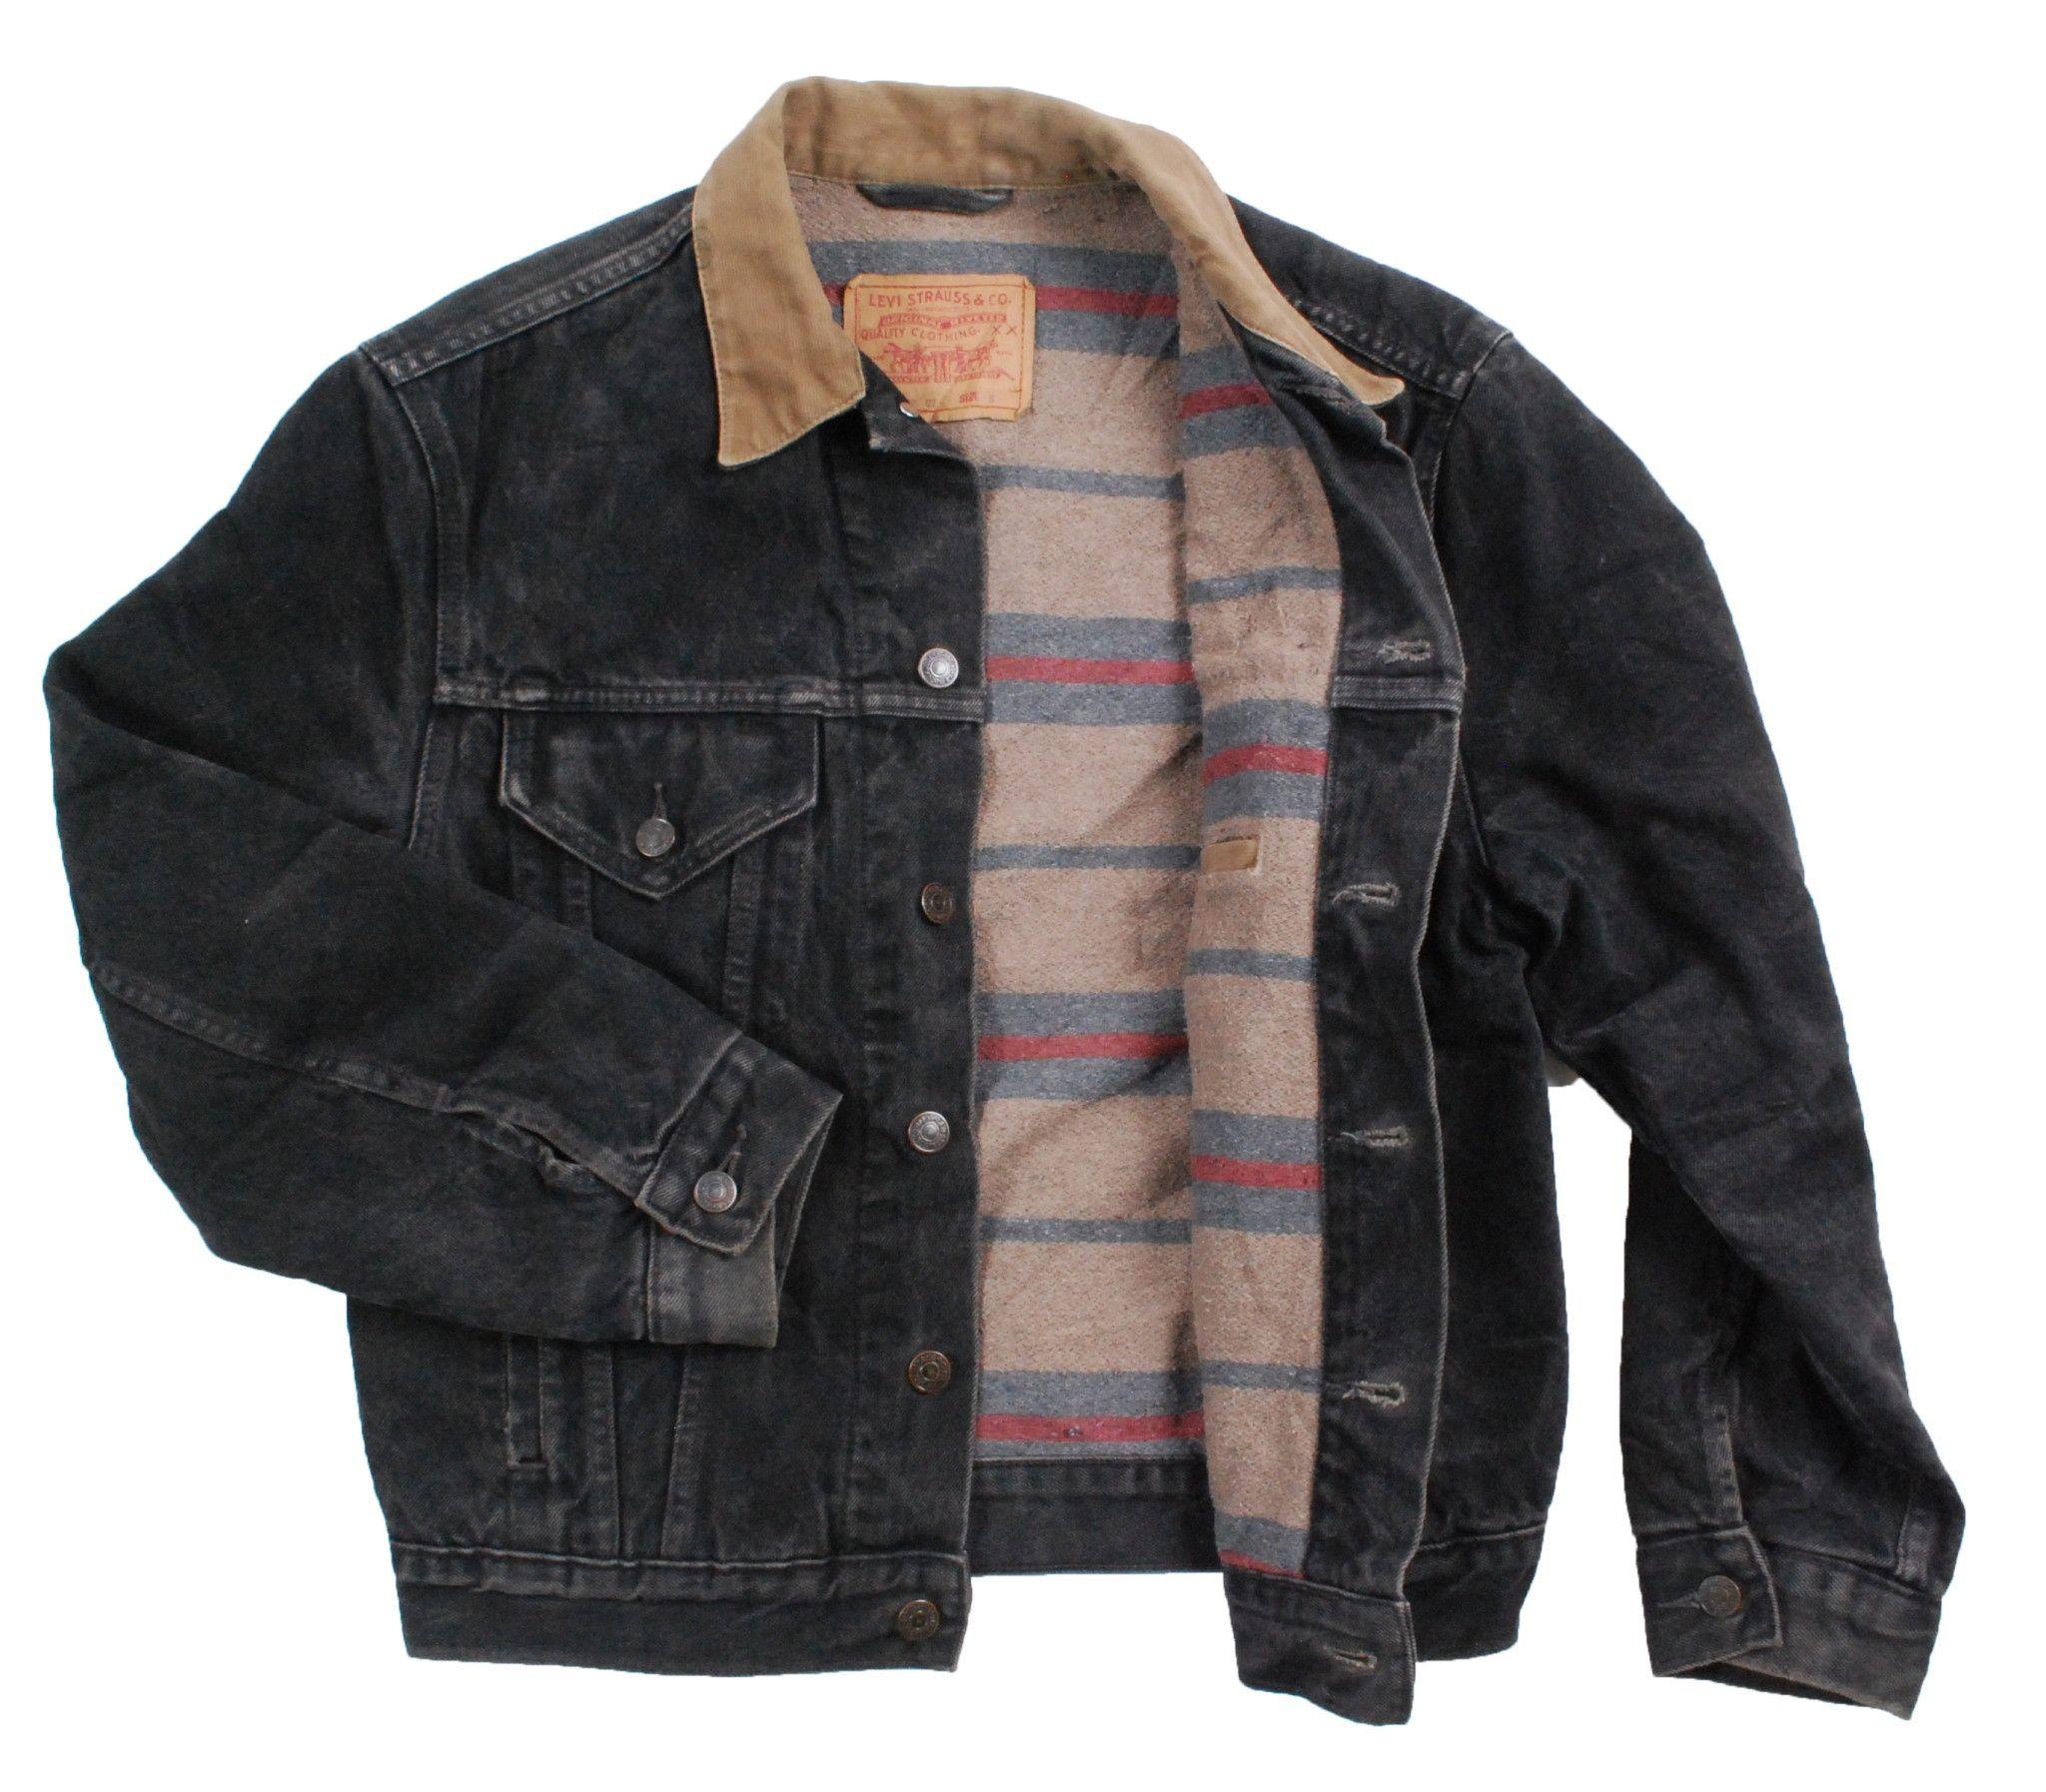 88e901a3 Vintage Black Blanket lined Levi 70602 02 denim jean jacket - Small ...